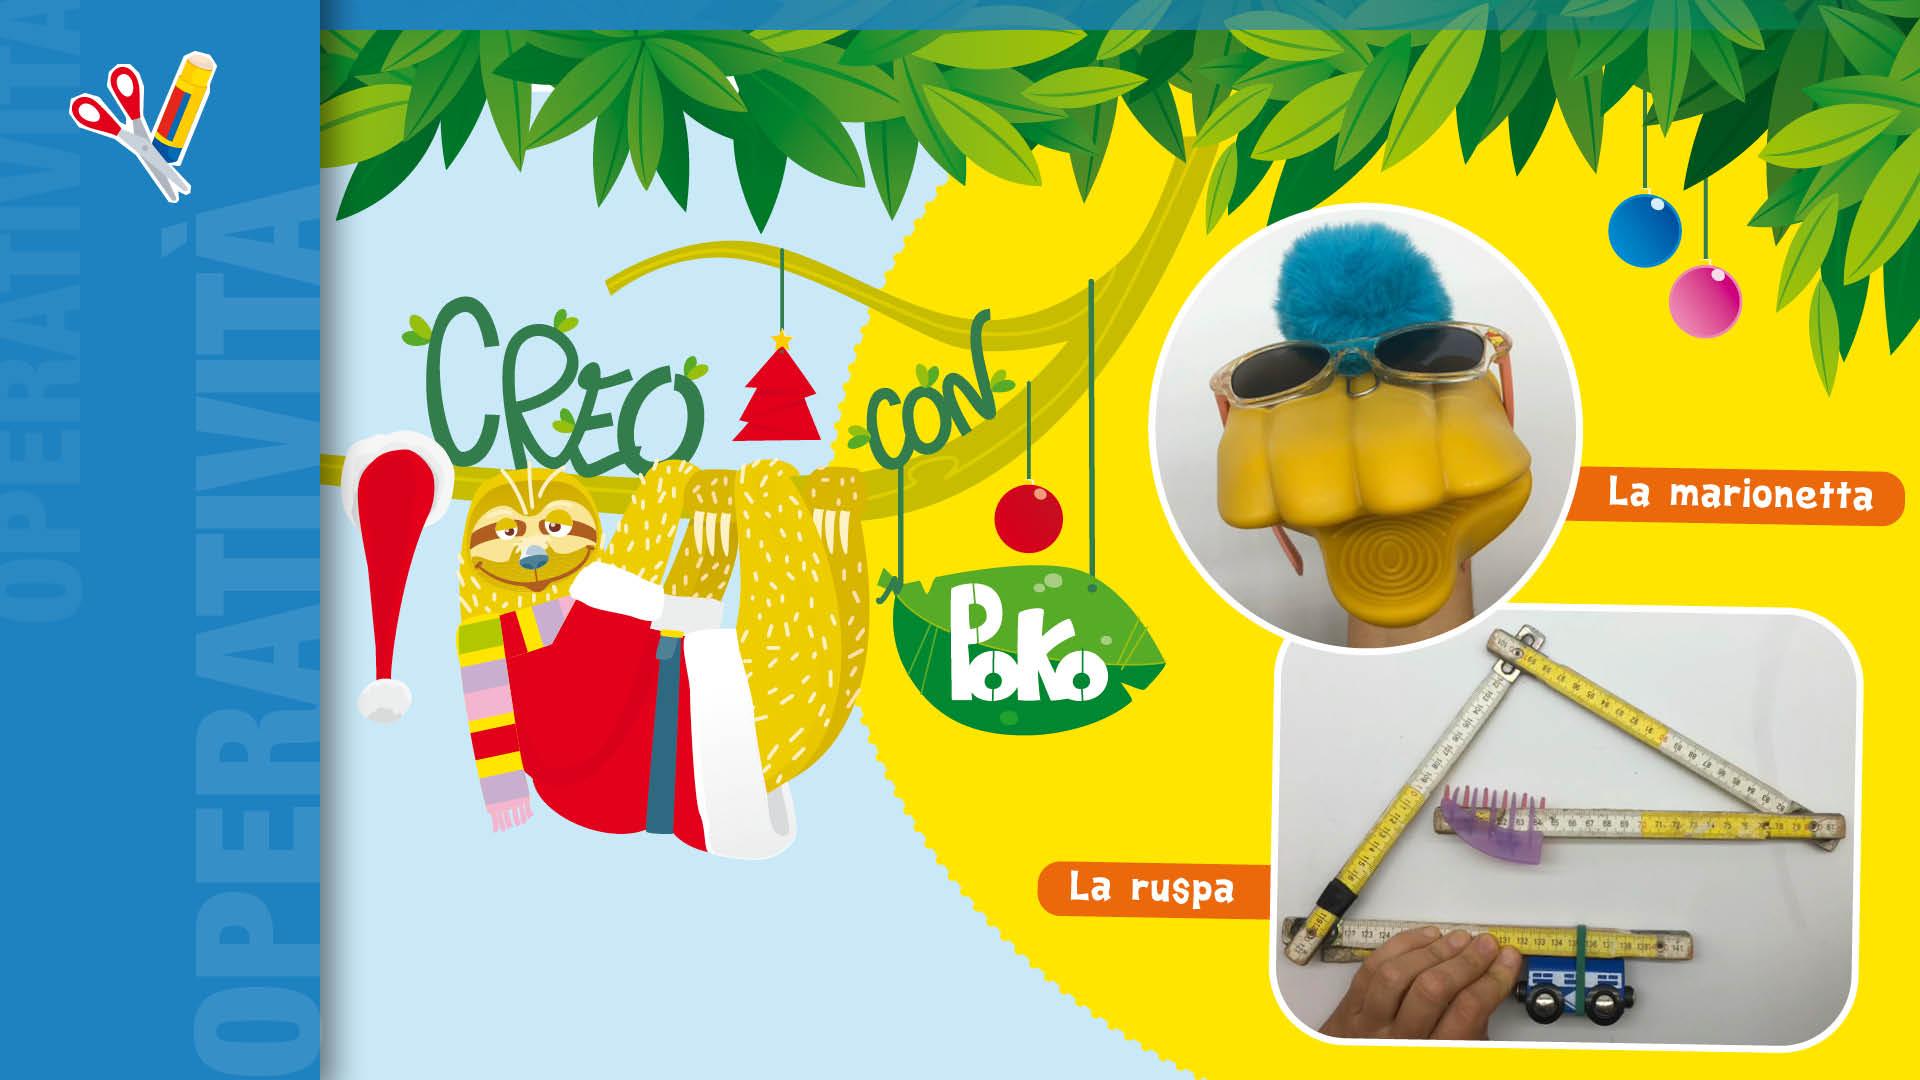 Creo con Poko Tinkering di Natale - Apertura